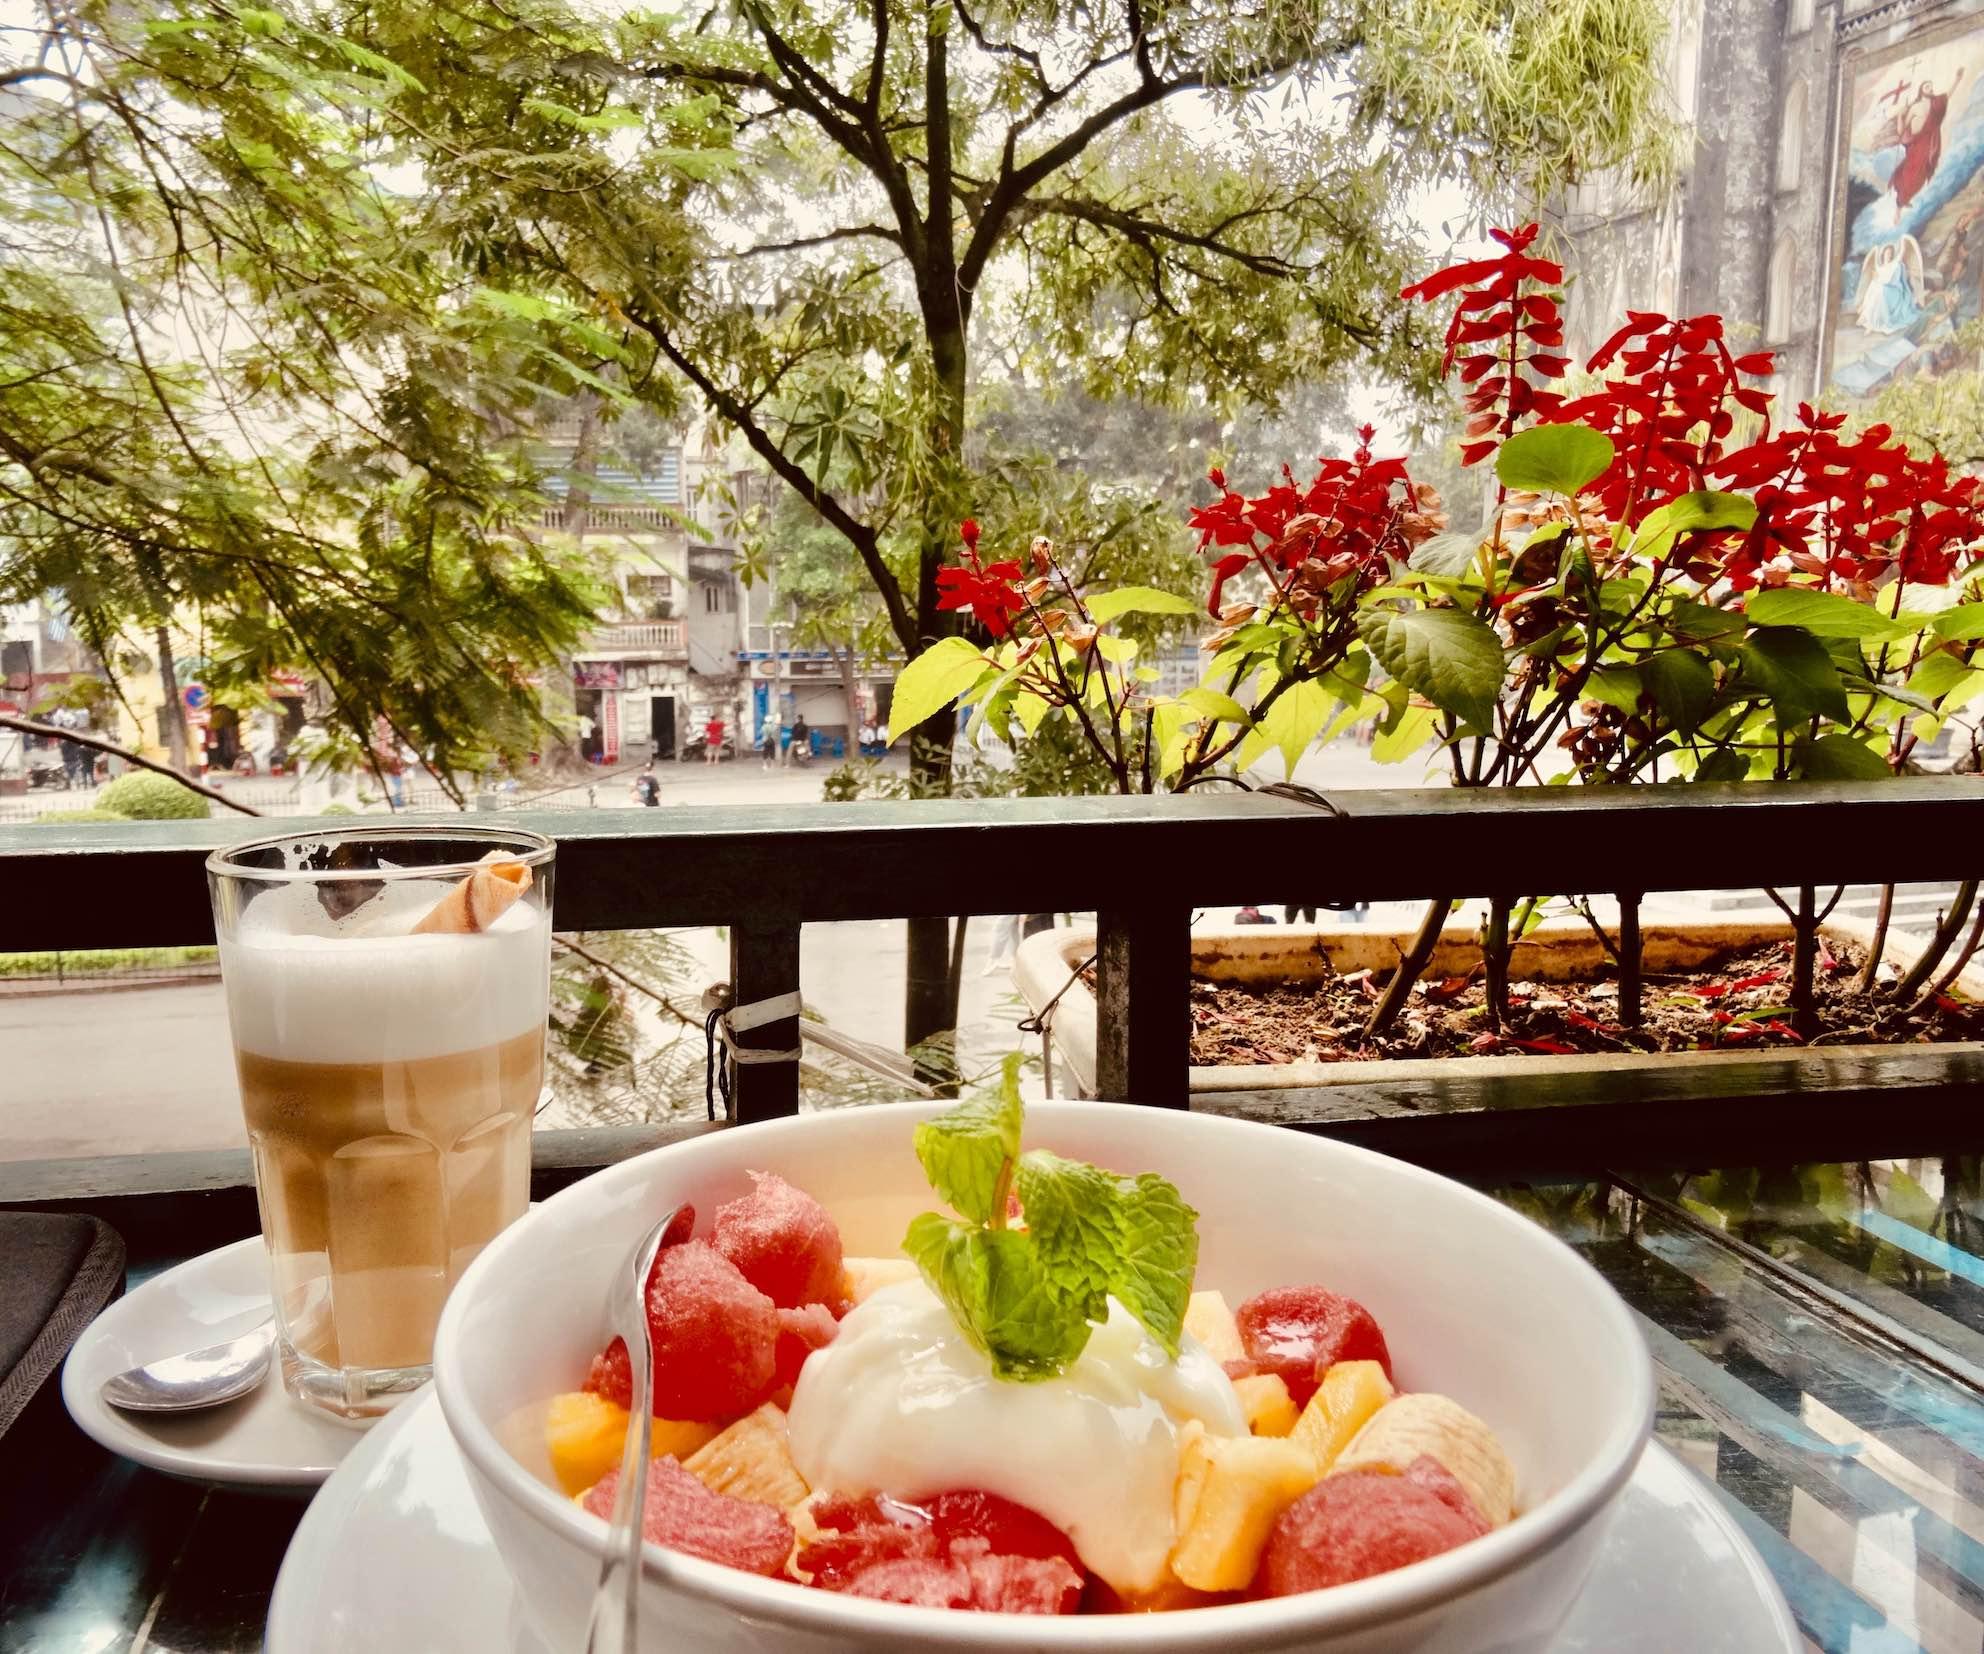 Breakfast at La Place Cafe in Hanoi.